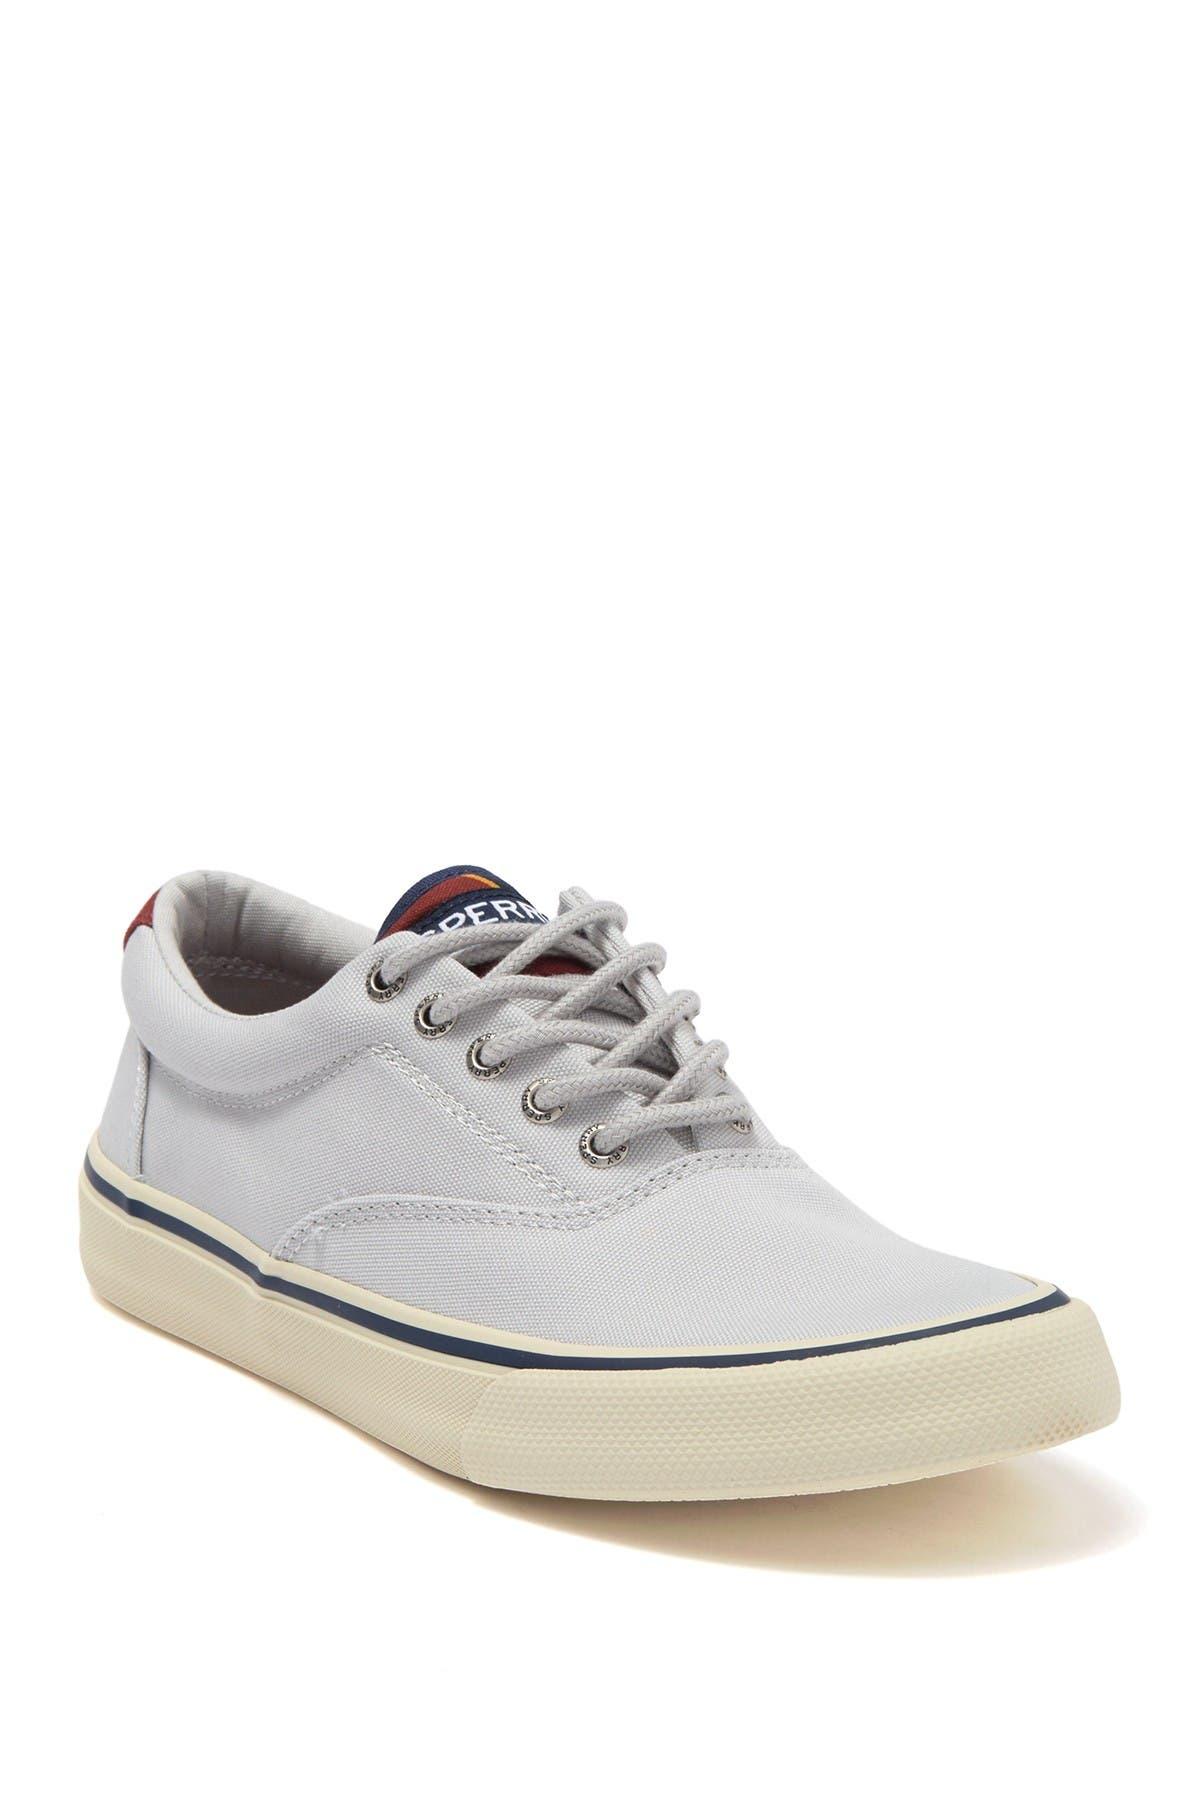 Image of Sperry Striper II Varsity CVO Sneaker